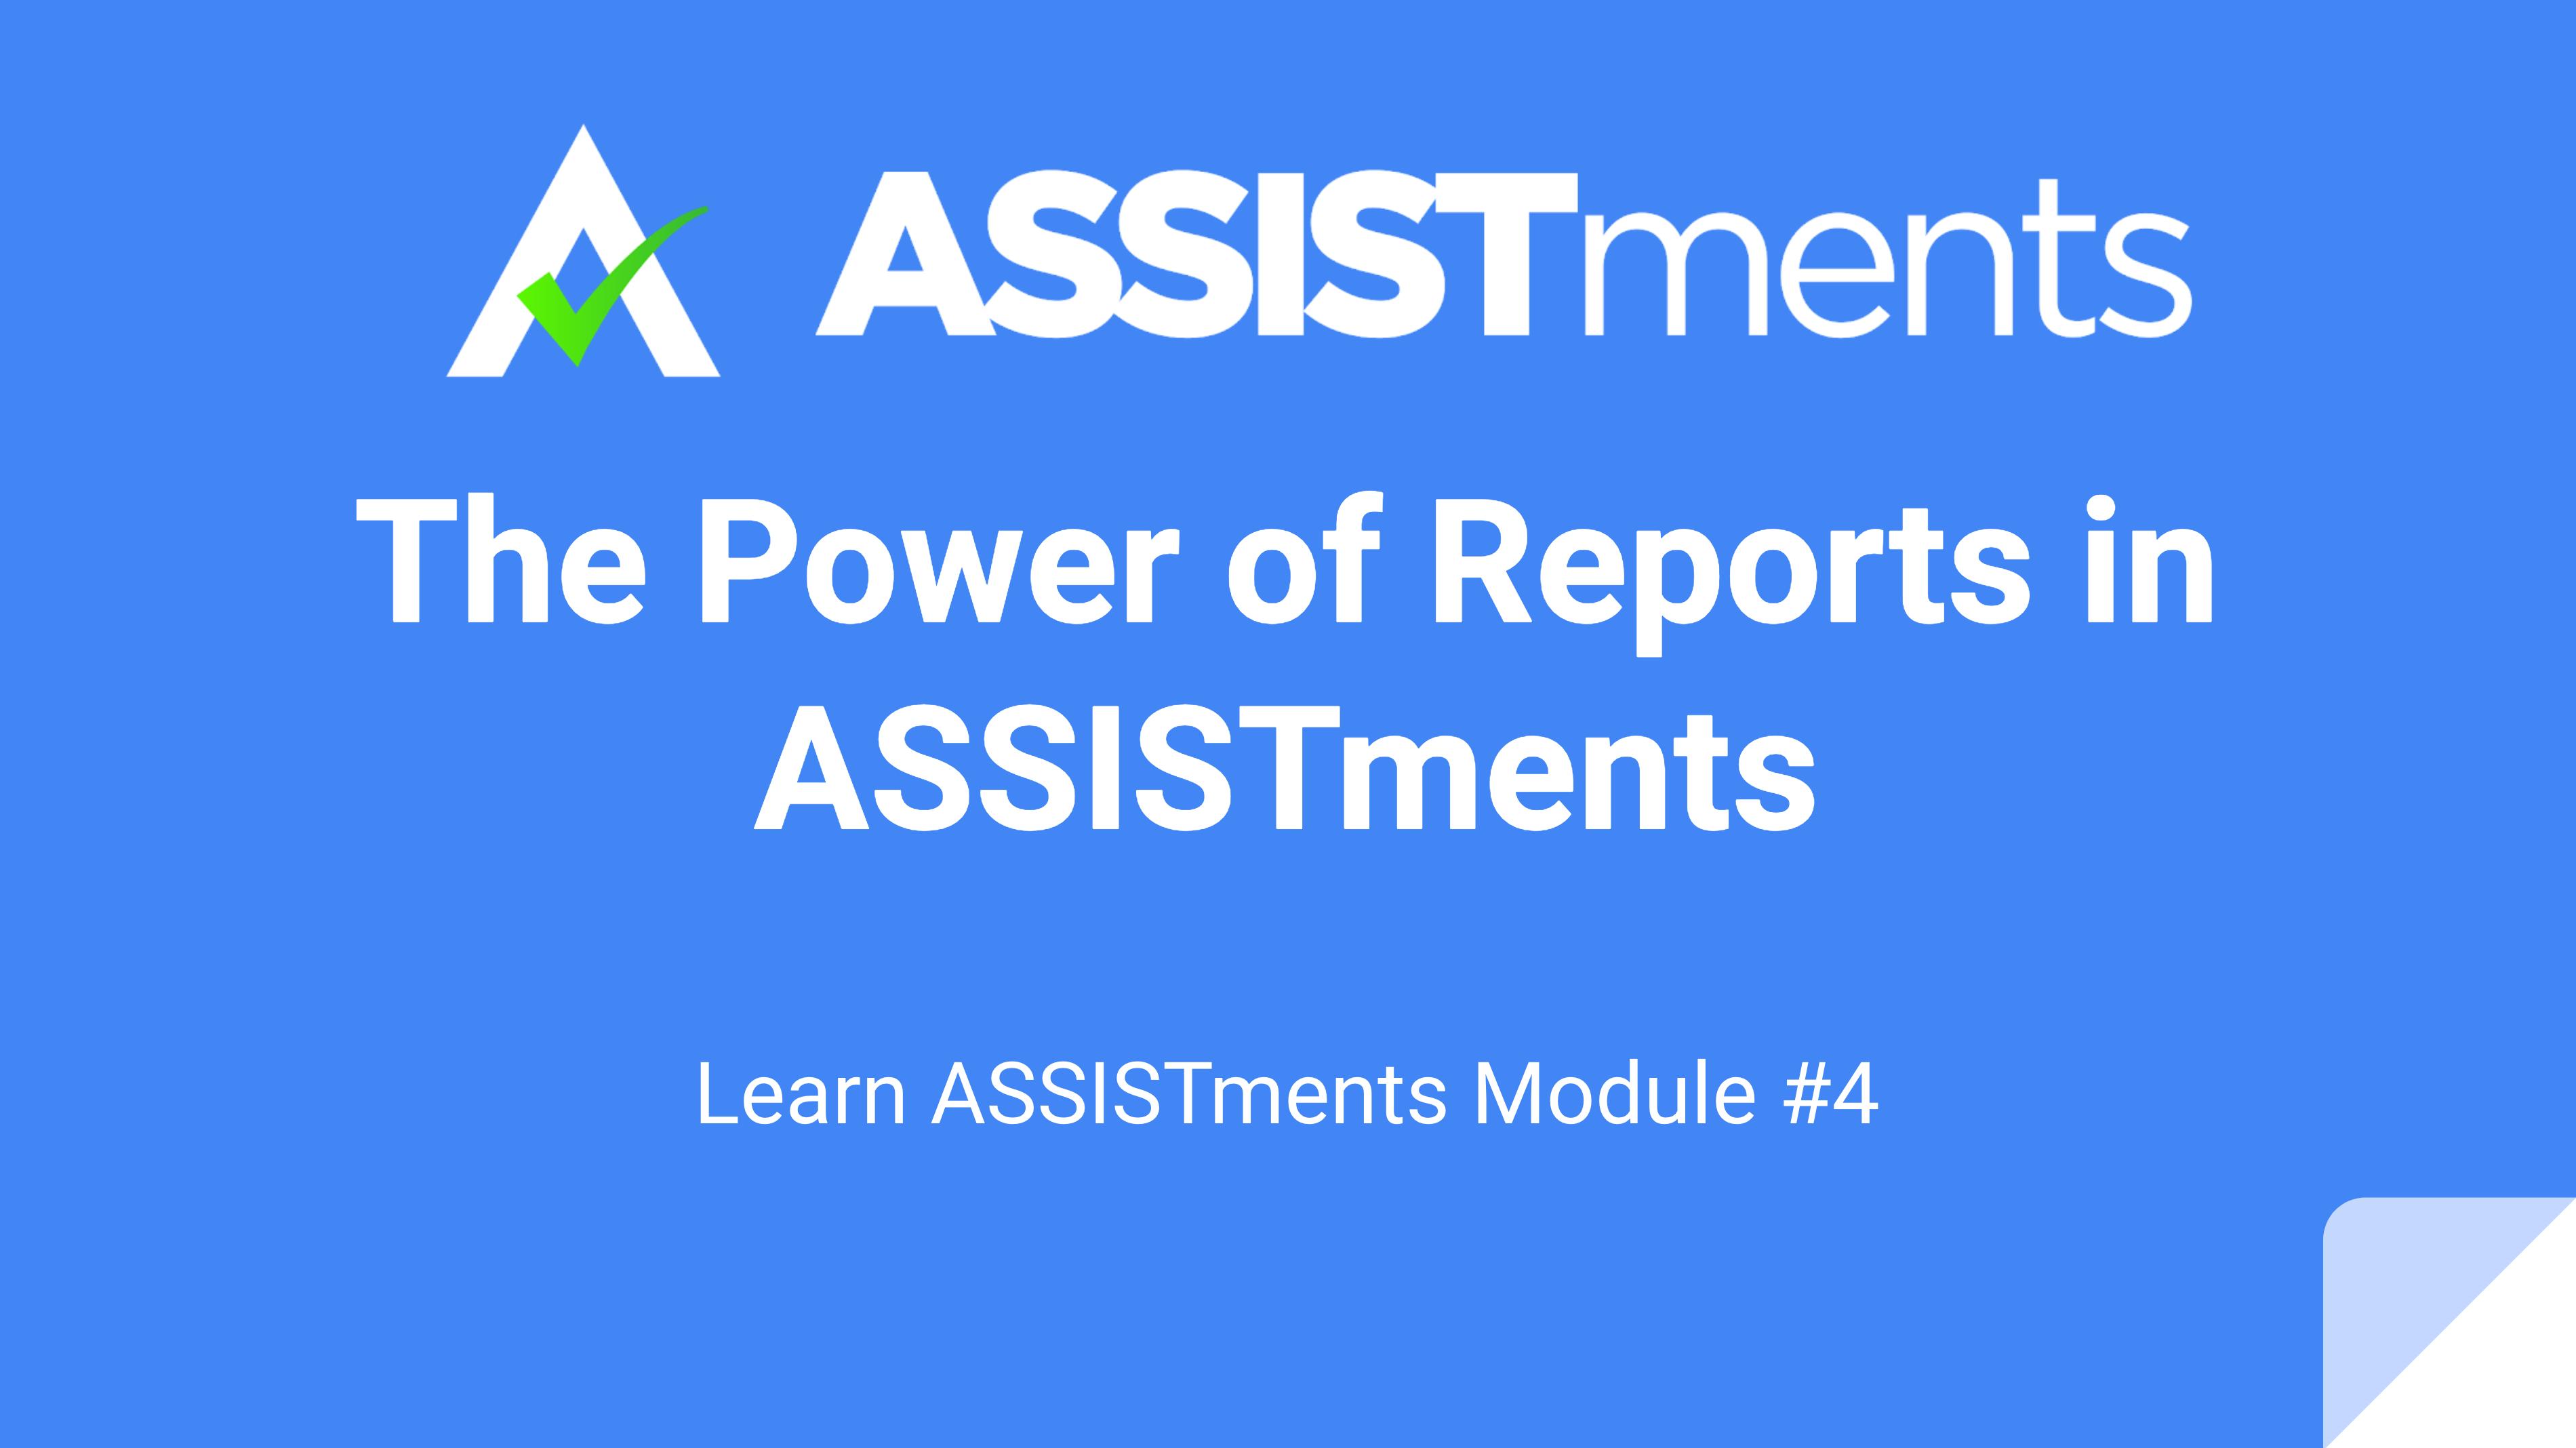 Learn ASSISTments Module #4